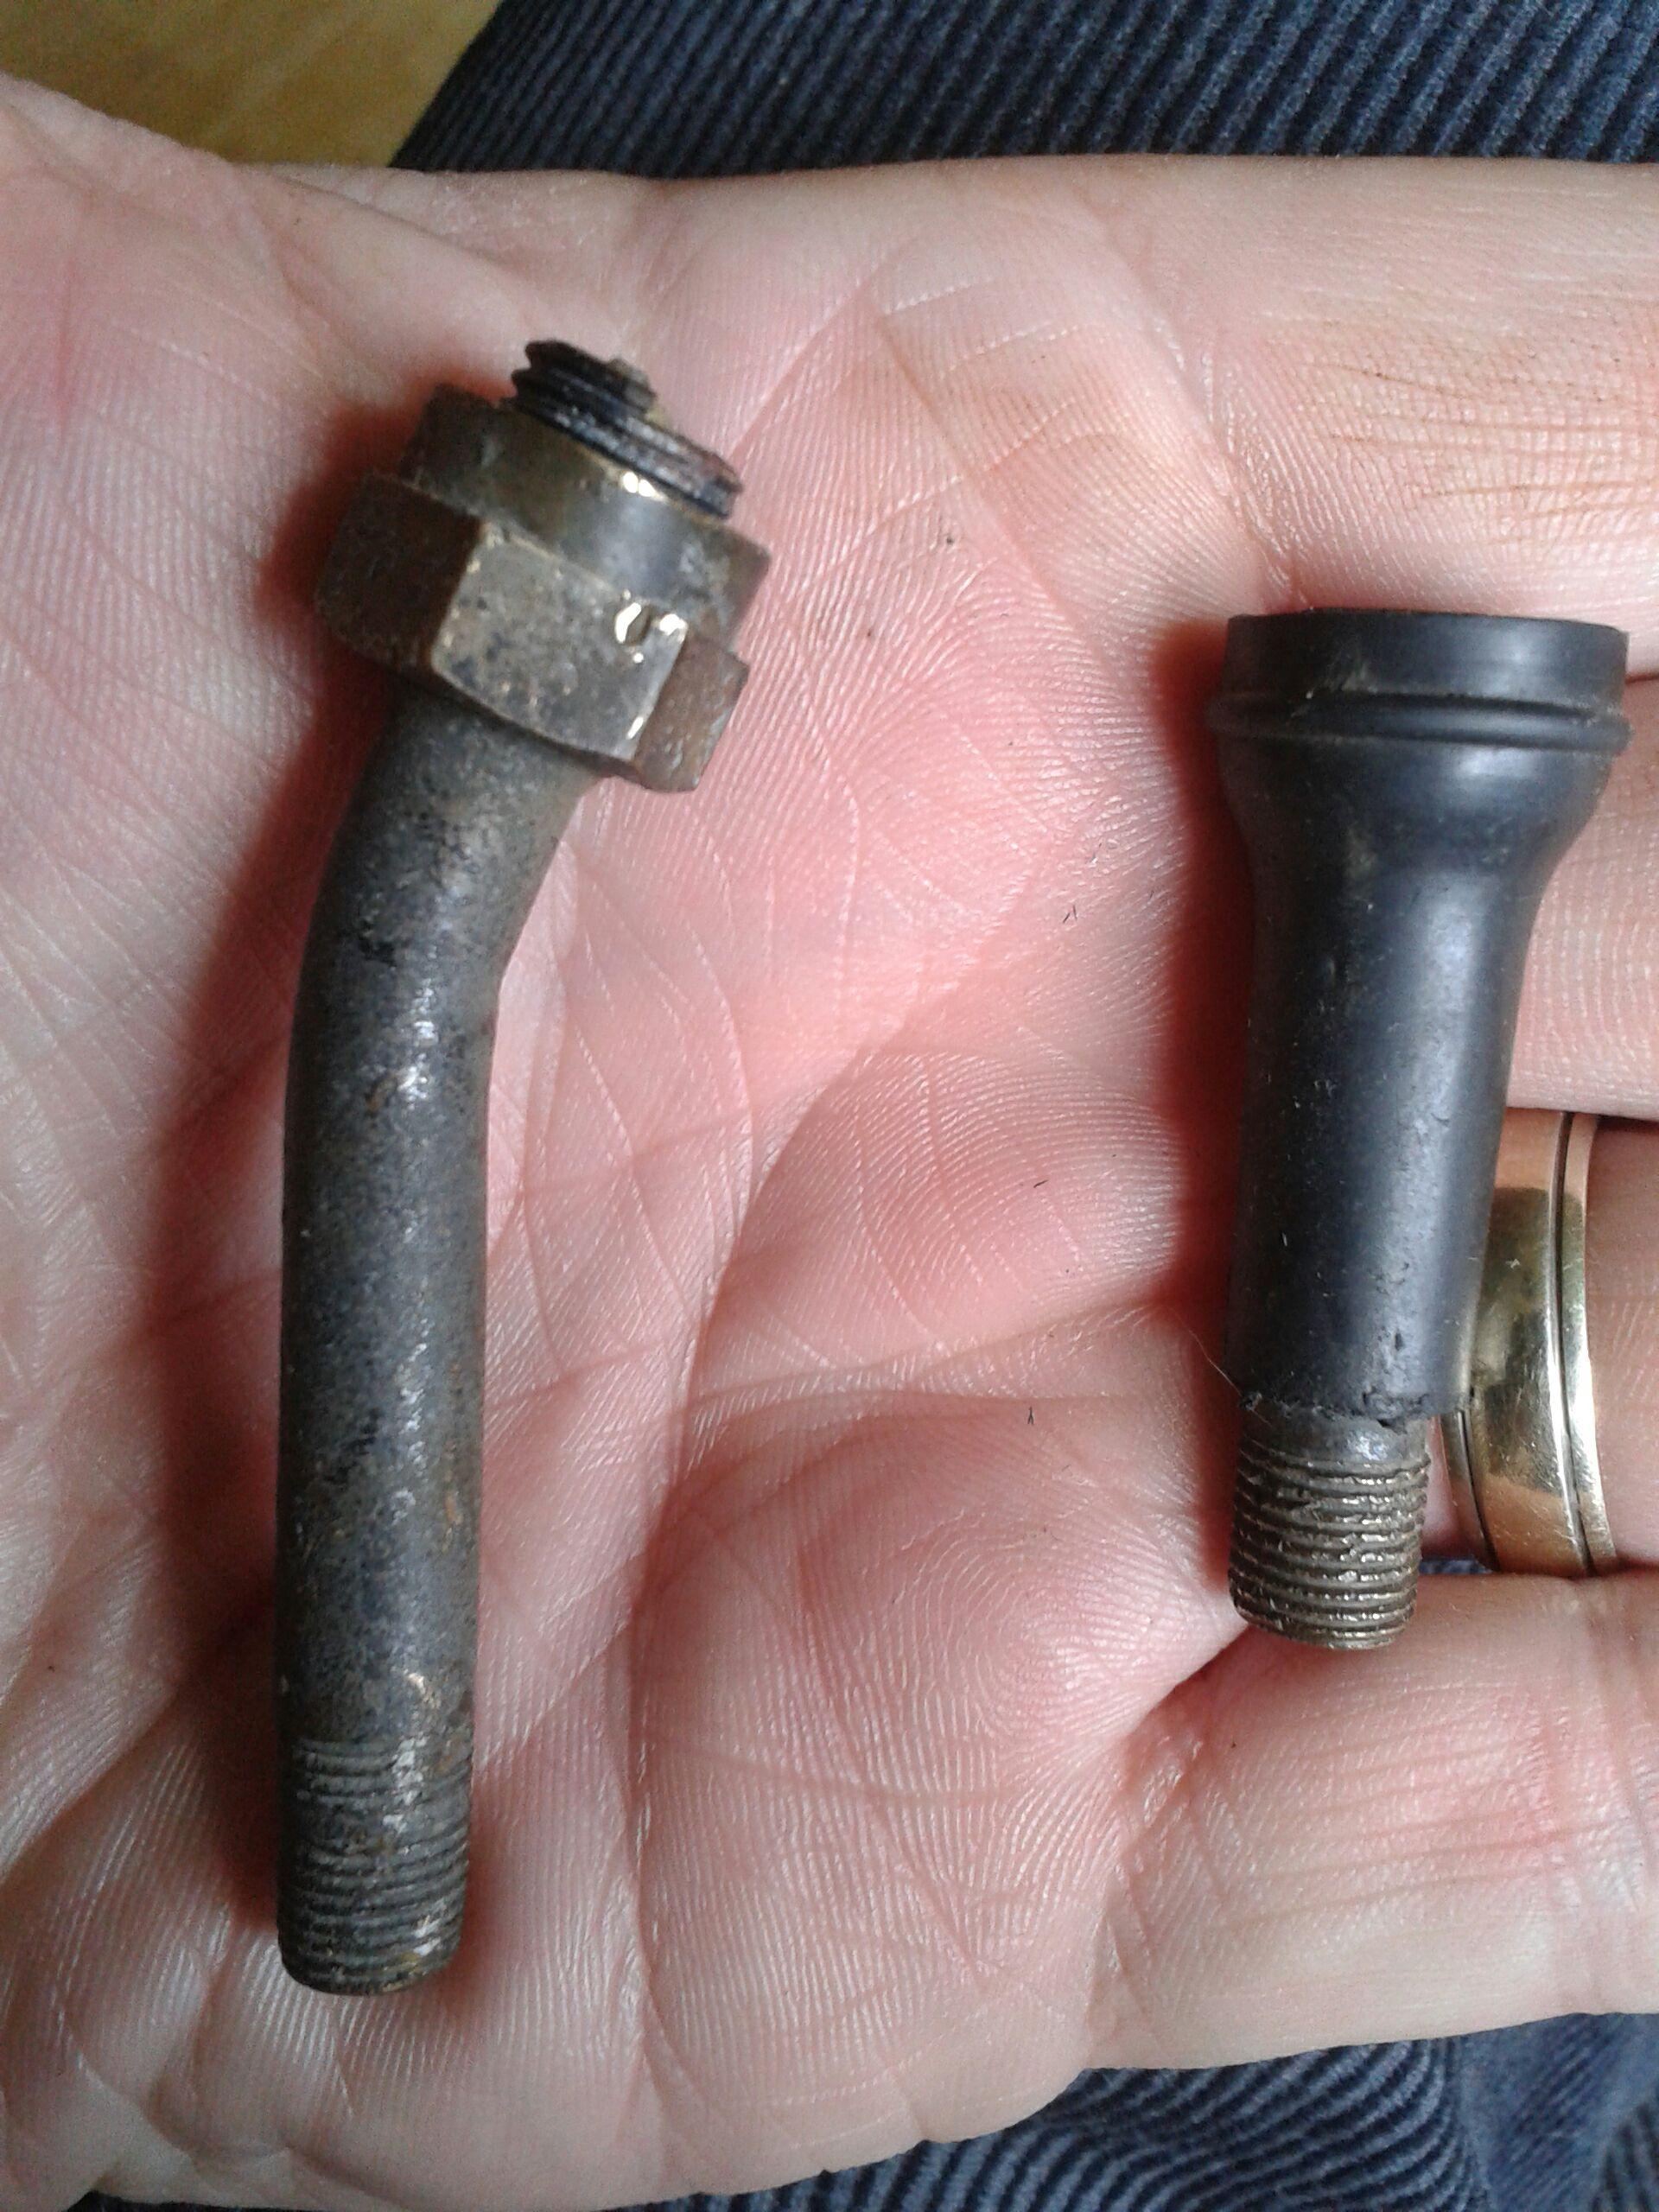 modifying a schrader tyre valve